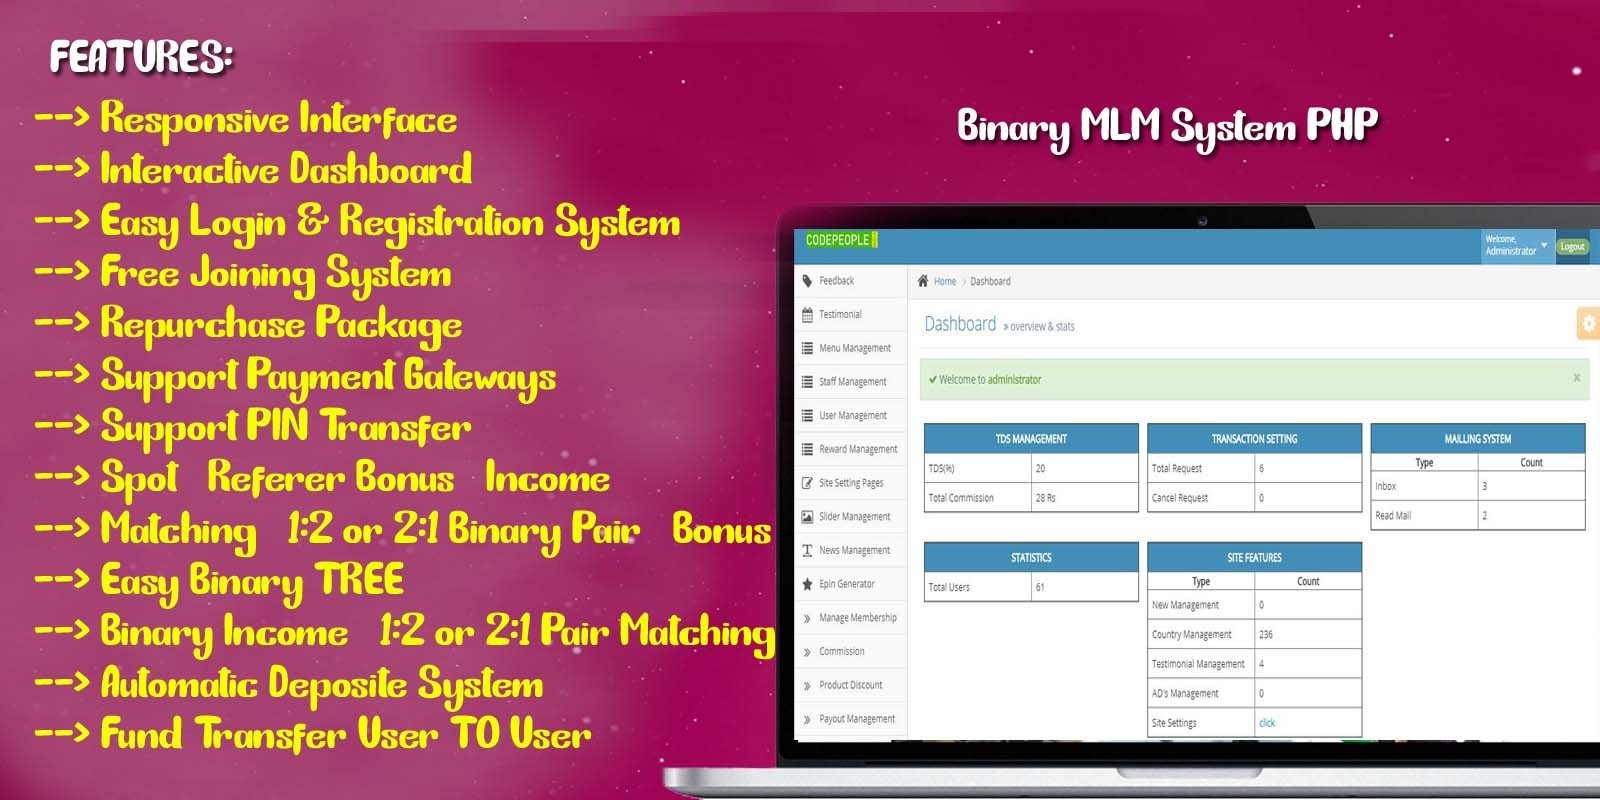 Binary MLM System PHP